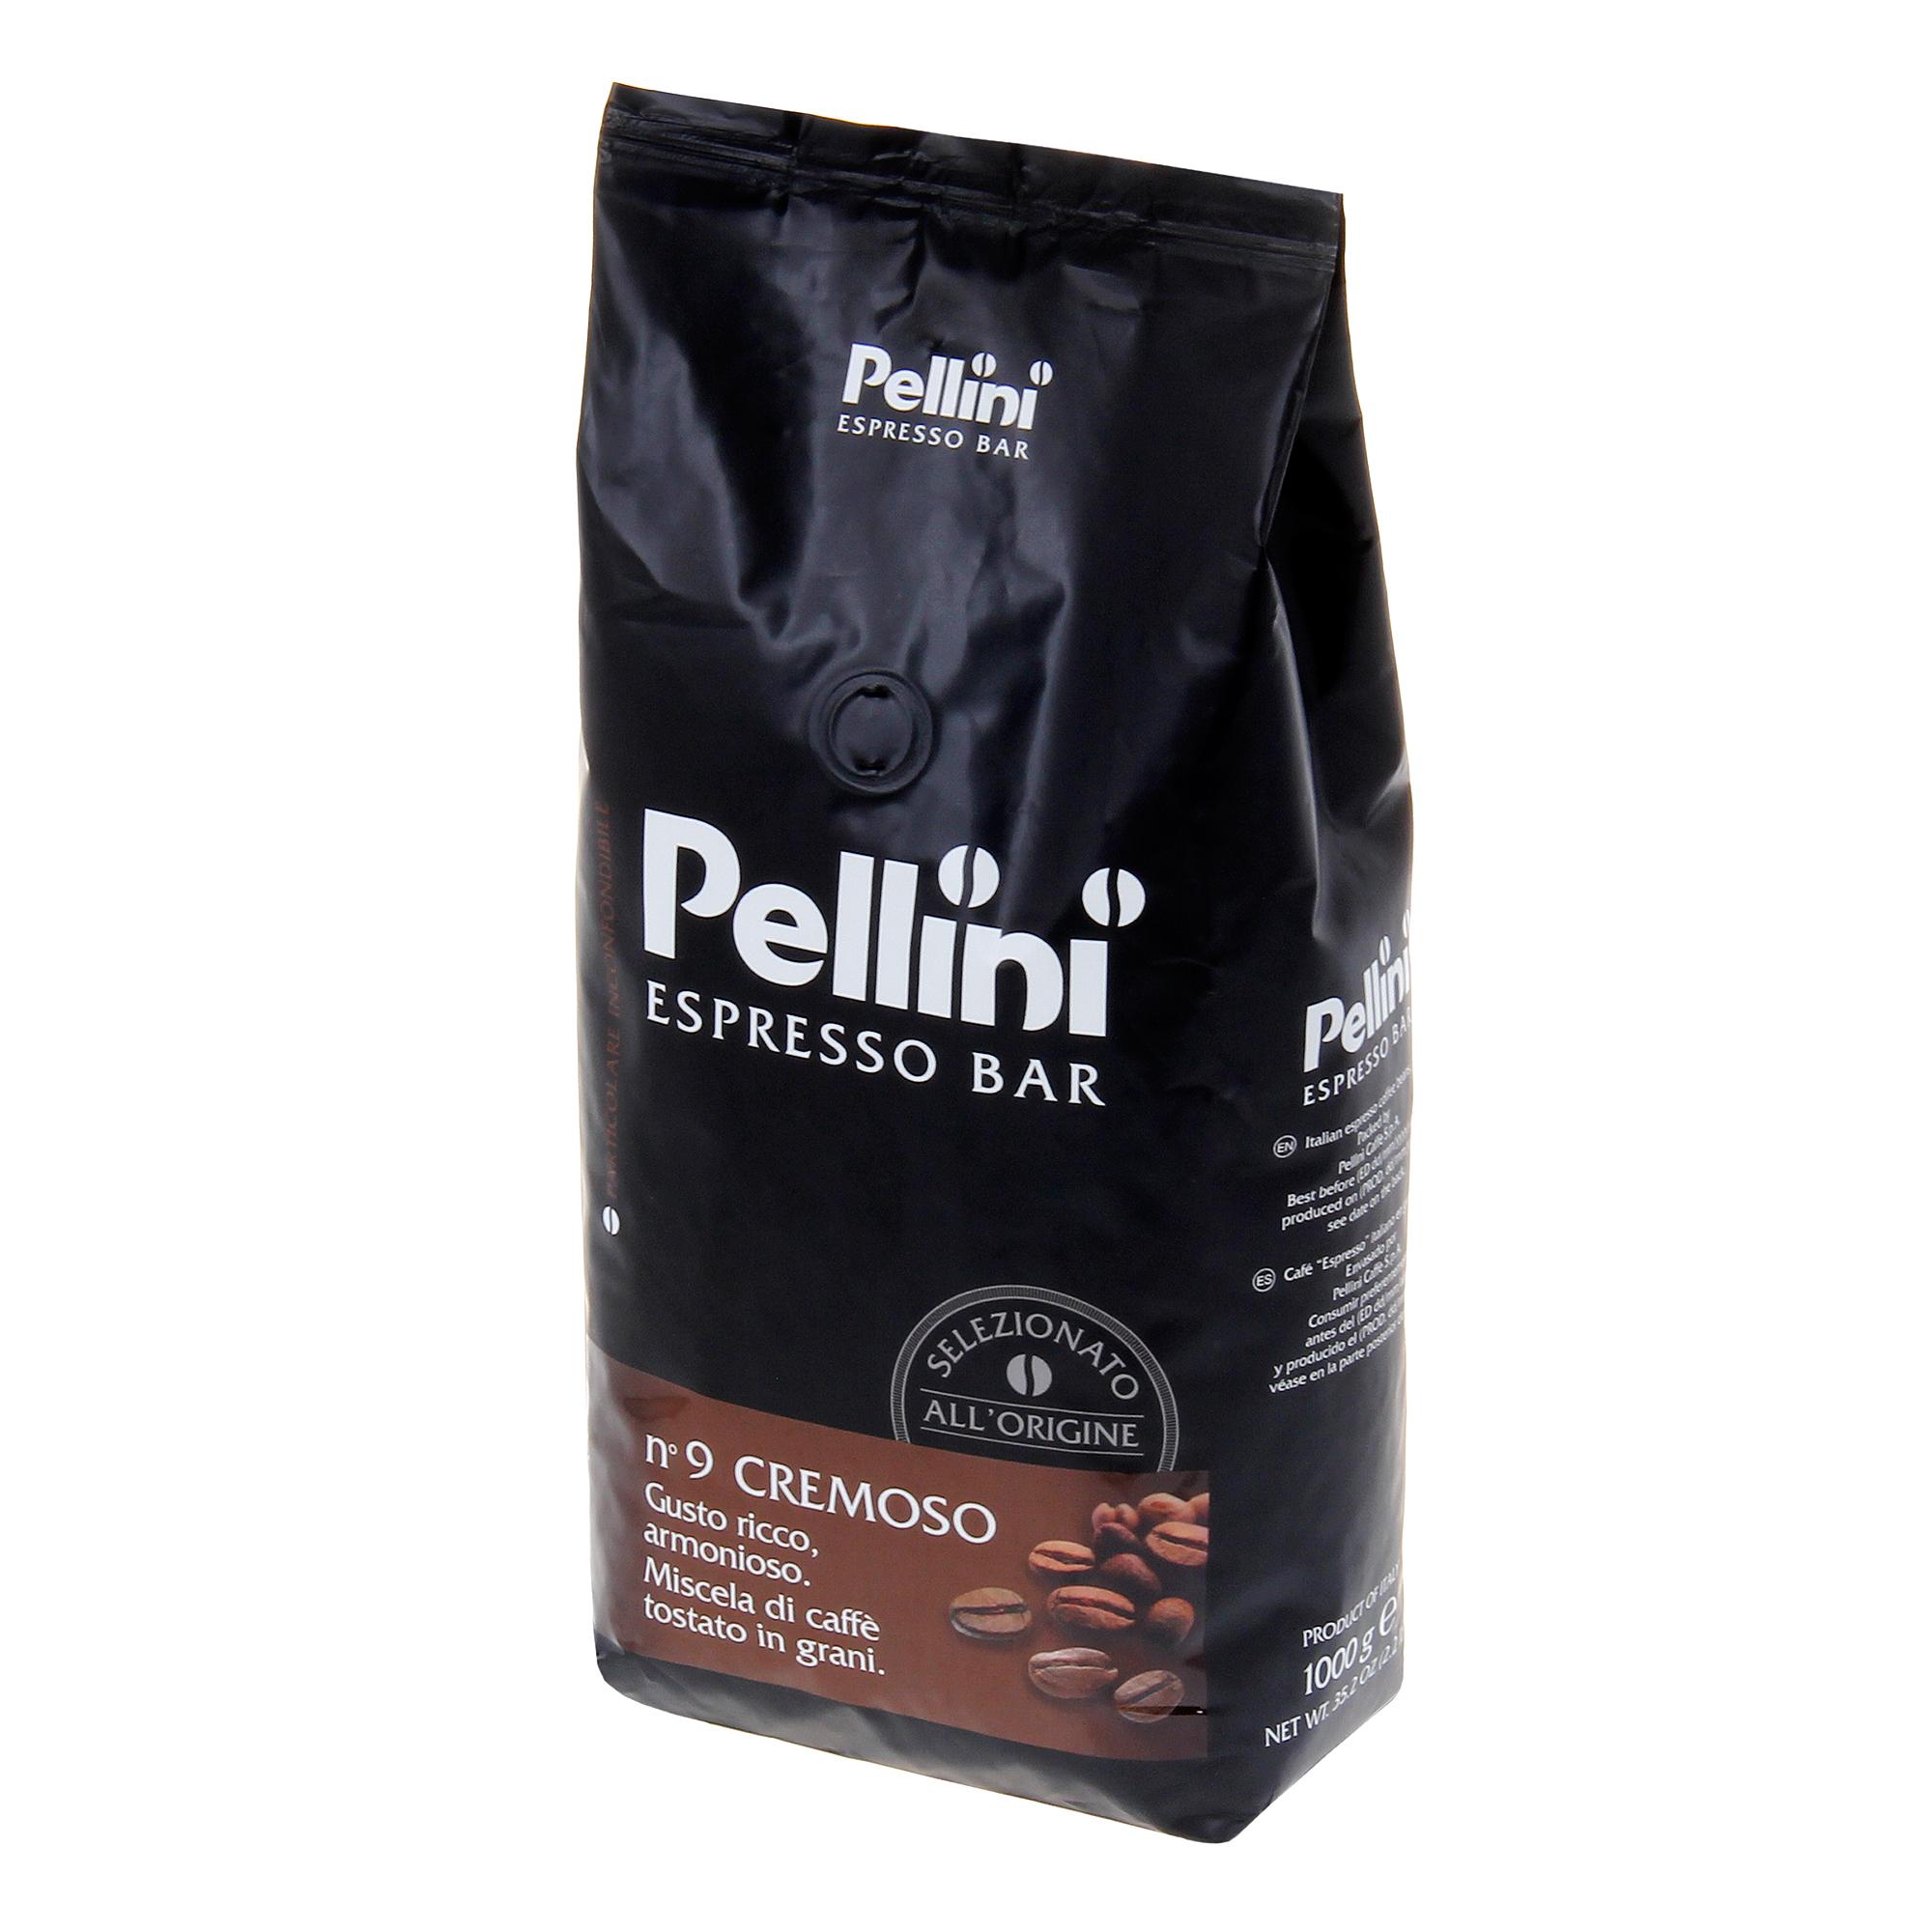 Кофе в зернах Pellini Espresso Bar Cremoso 1 кг кофе в зернах kimbo espresso bar prestige 1000